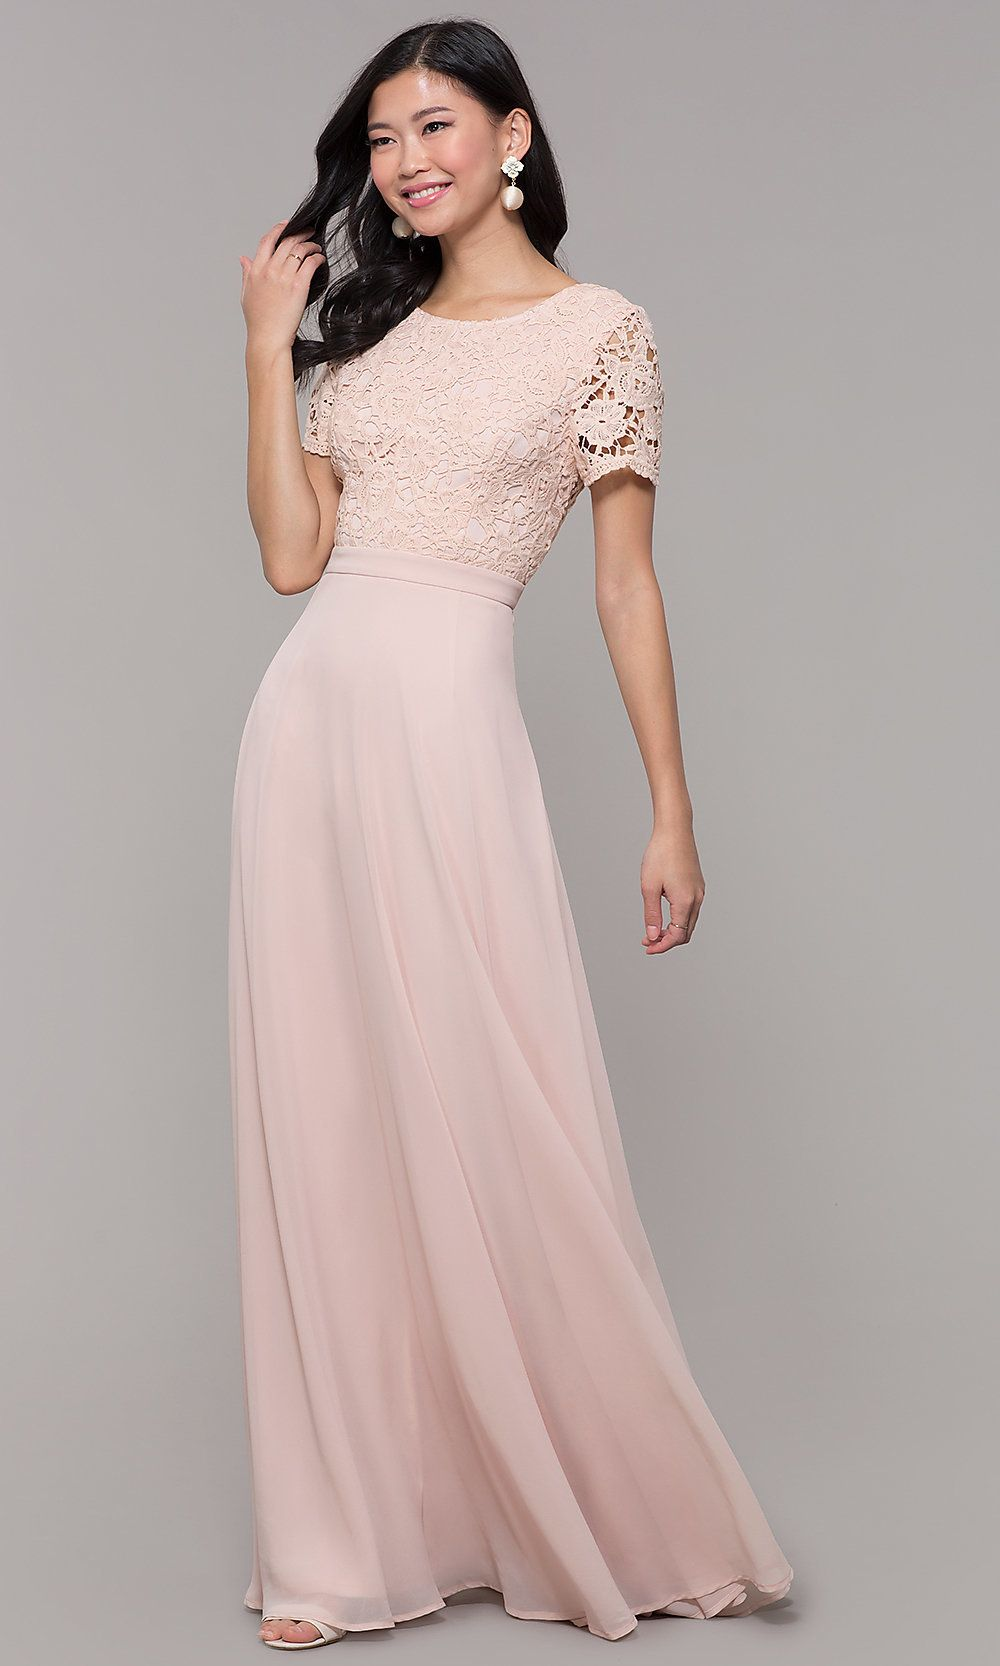 c1ea98609c1 Long Chiffon Short-Sleeve Lace-Bodice Prom Dress in 2019